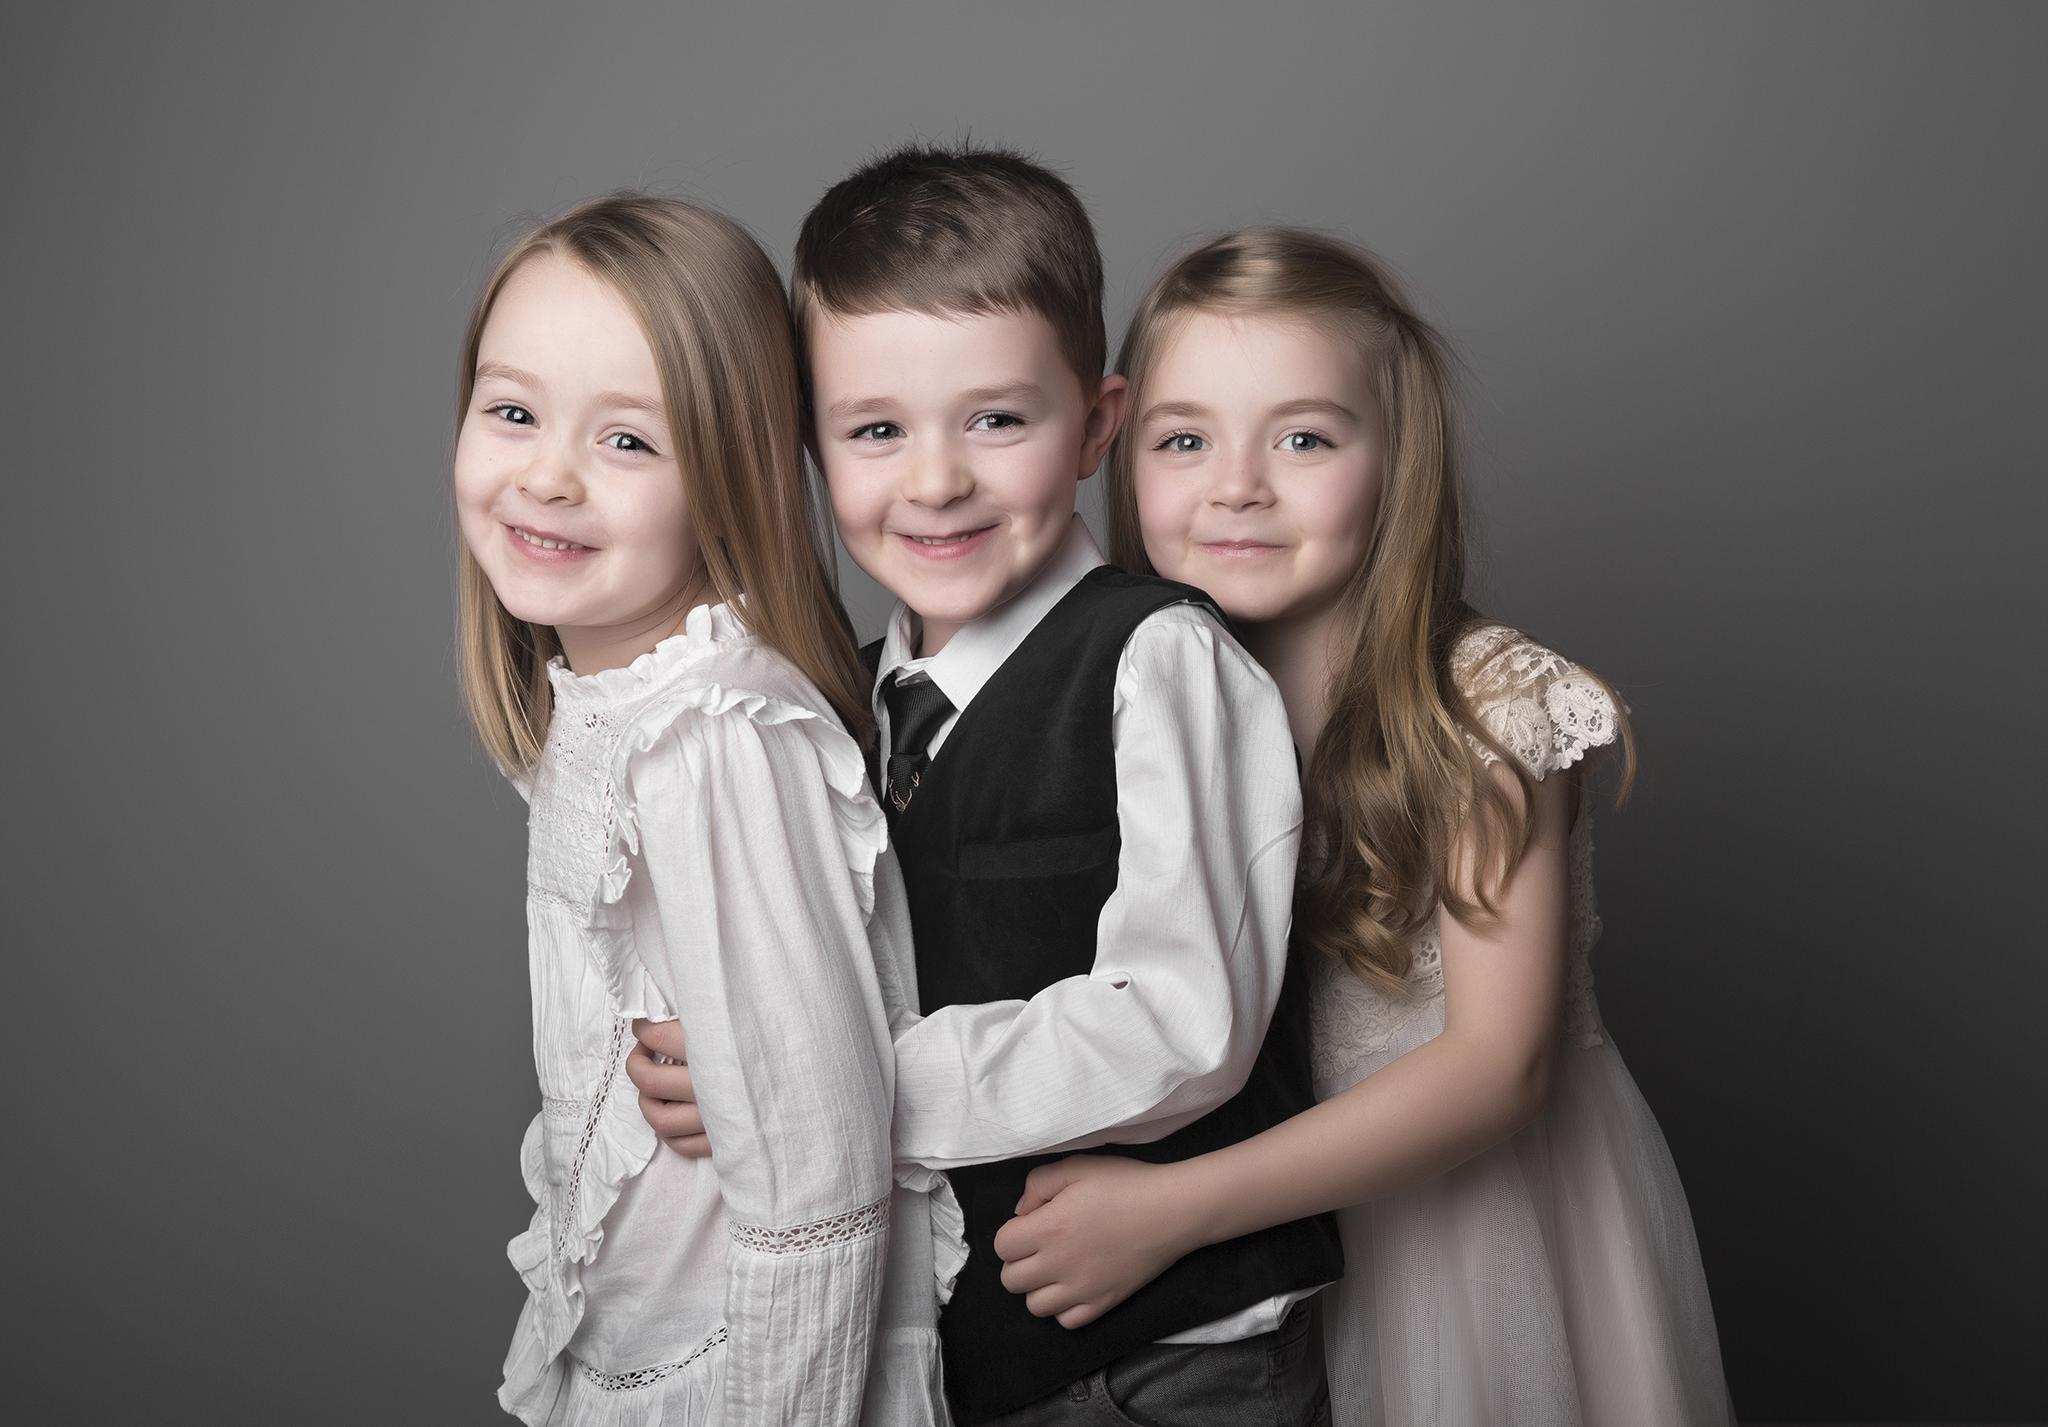 elizabethg_photography_hertfordshire_fineart_photographer_family_overhead_04.jpg